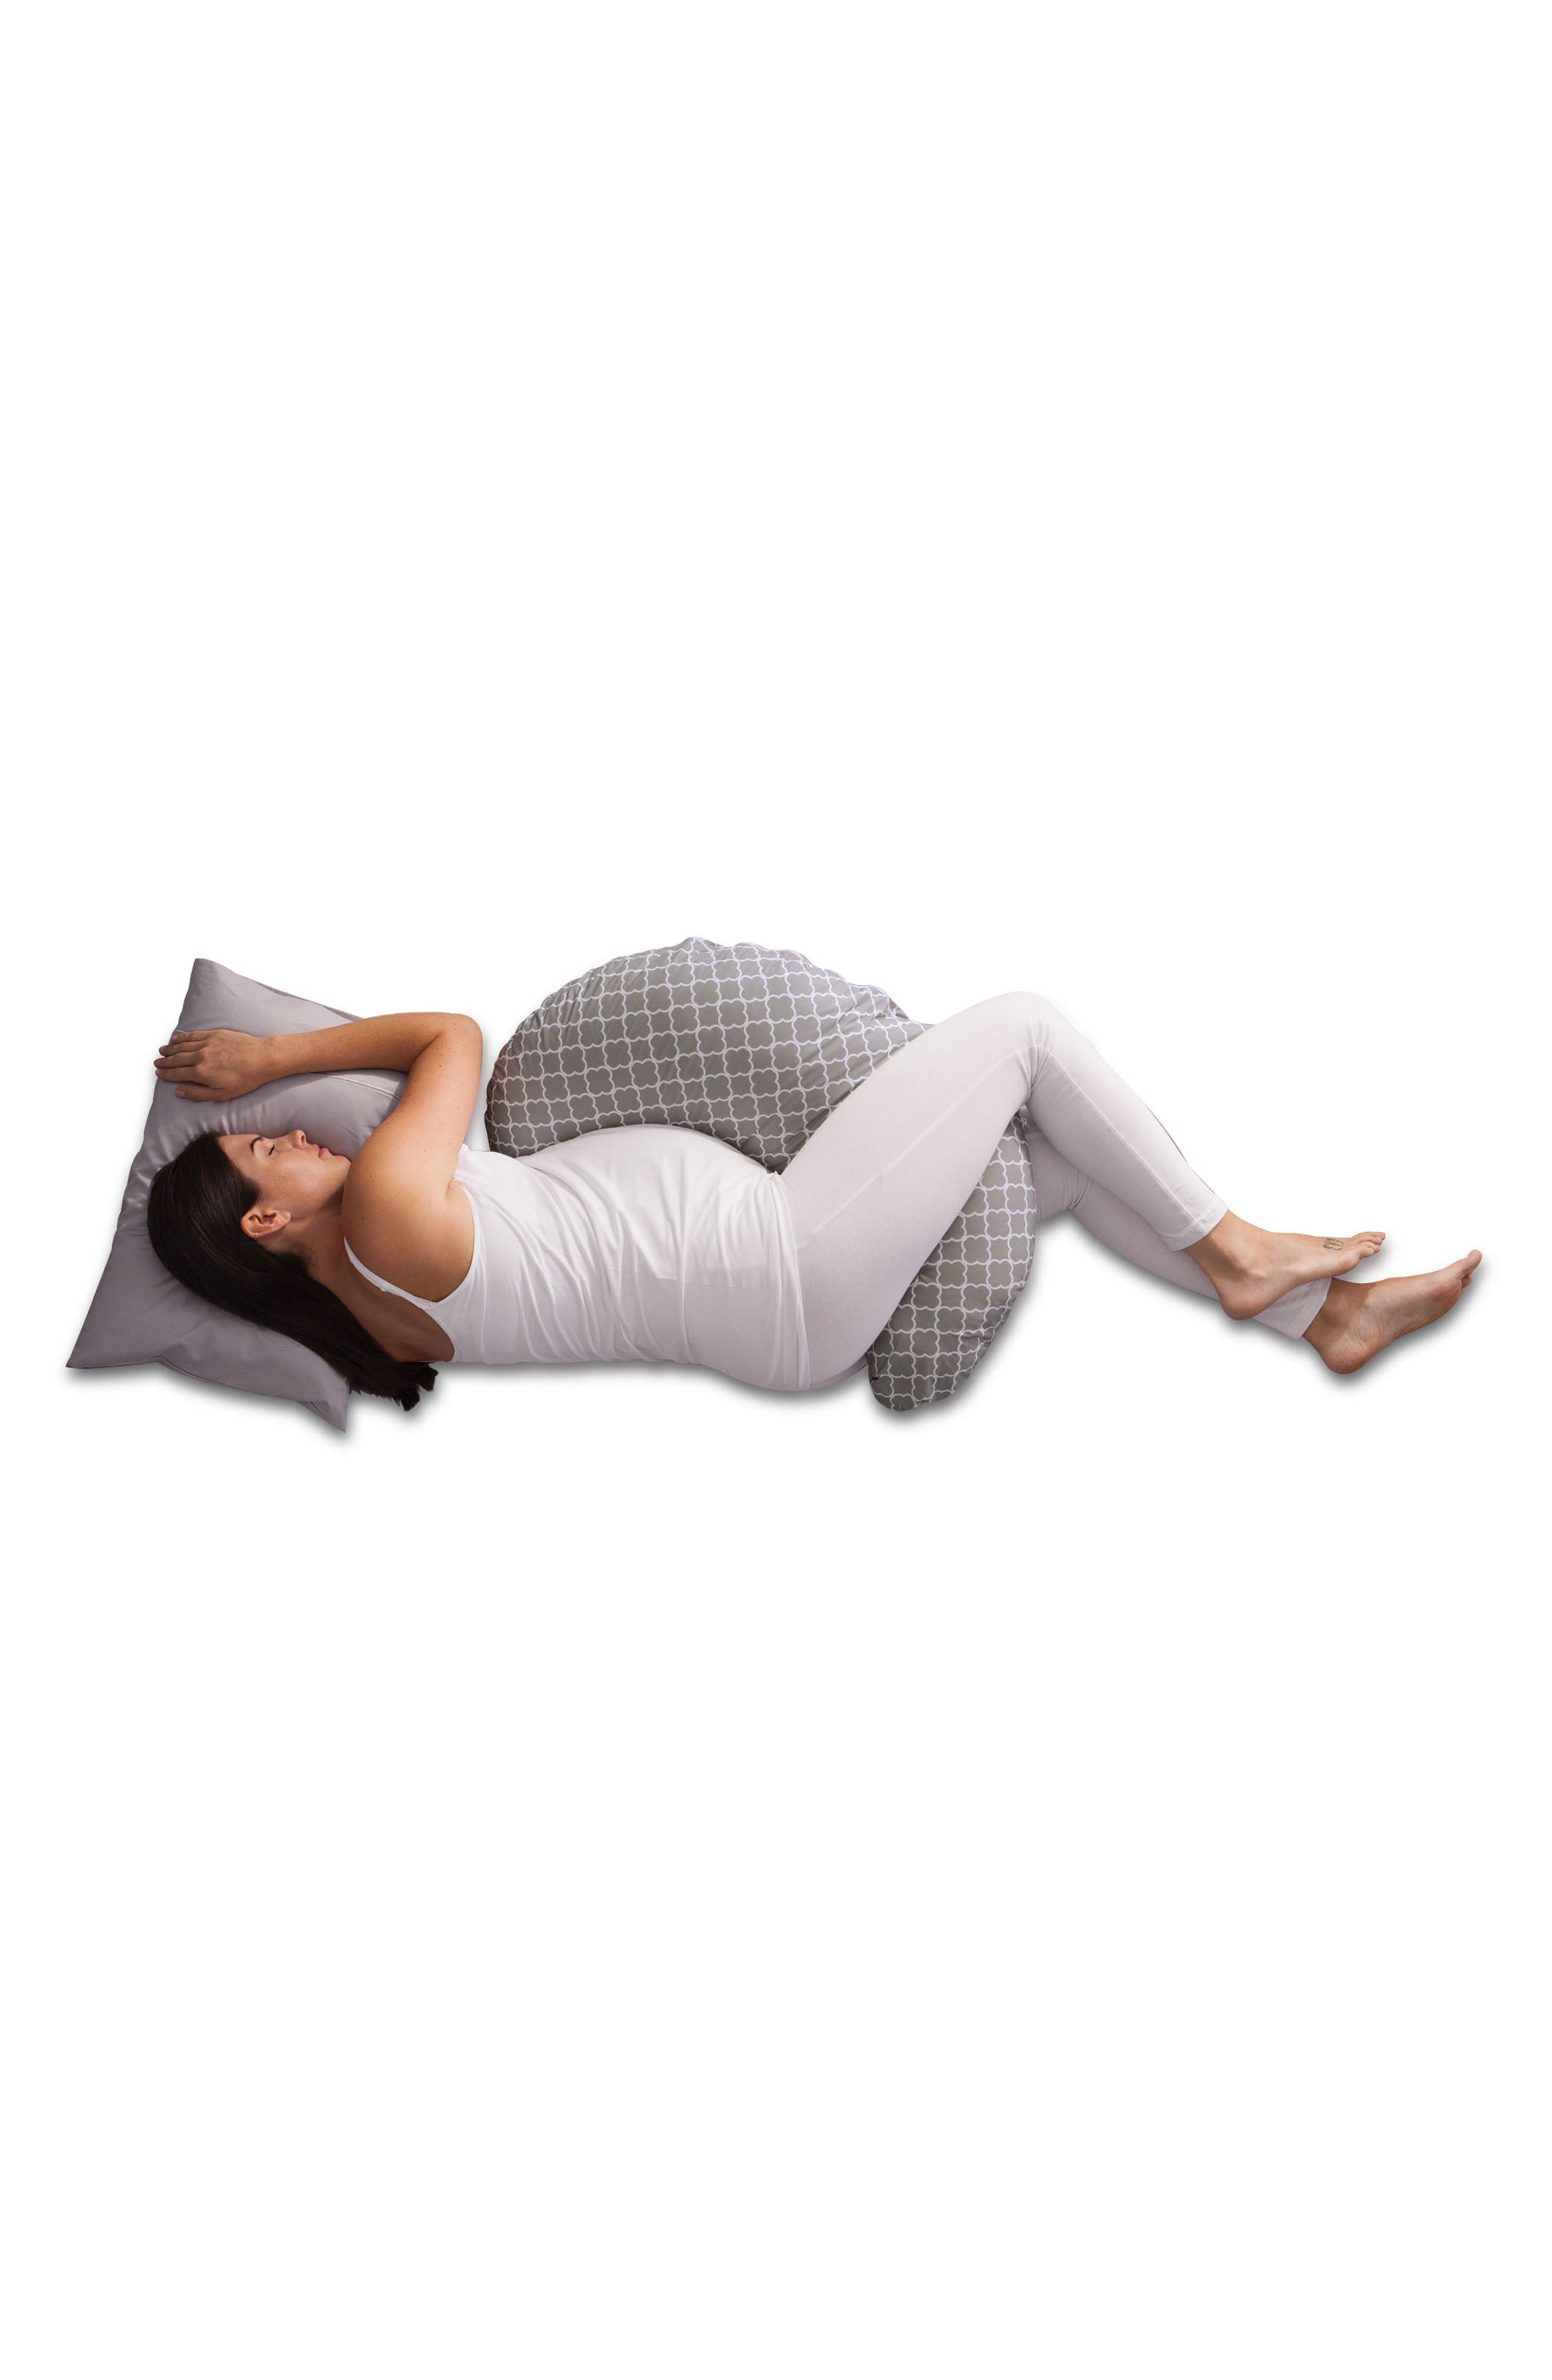 Multi-use Pregnancy Support Pillow,                             Alternate thumbnail 3, color,                             GREY TRELLIS